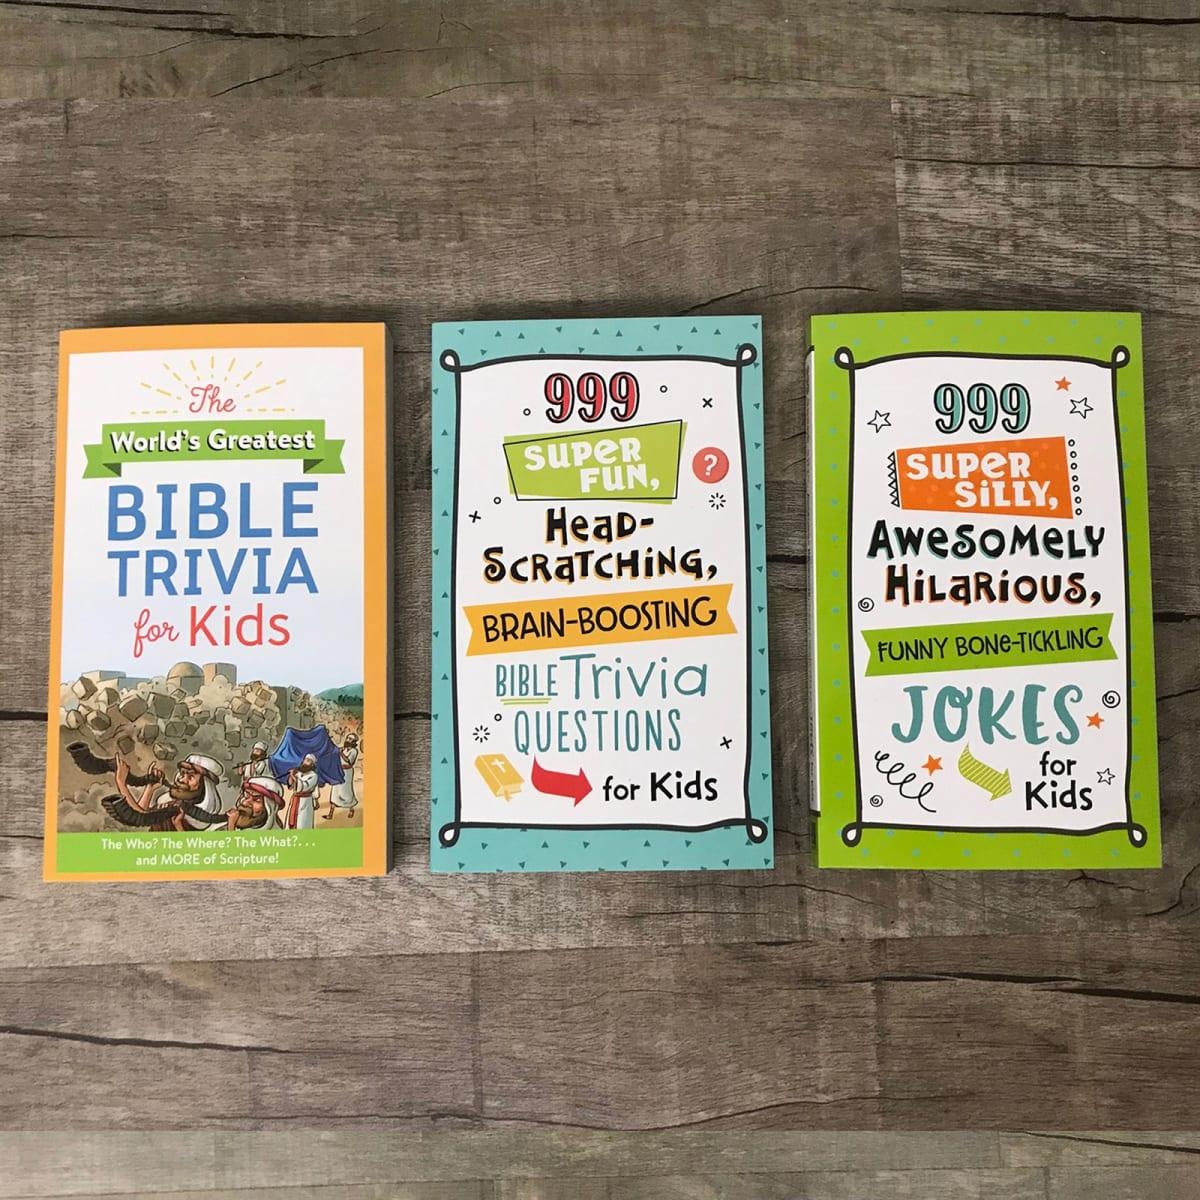 Fun Joke And Trivia For Kids